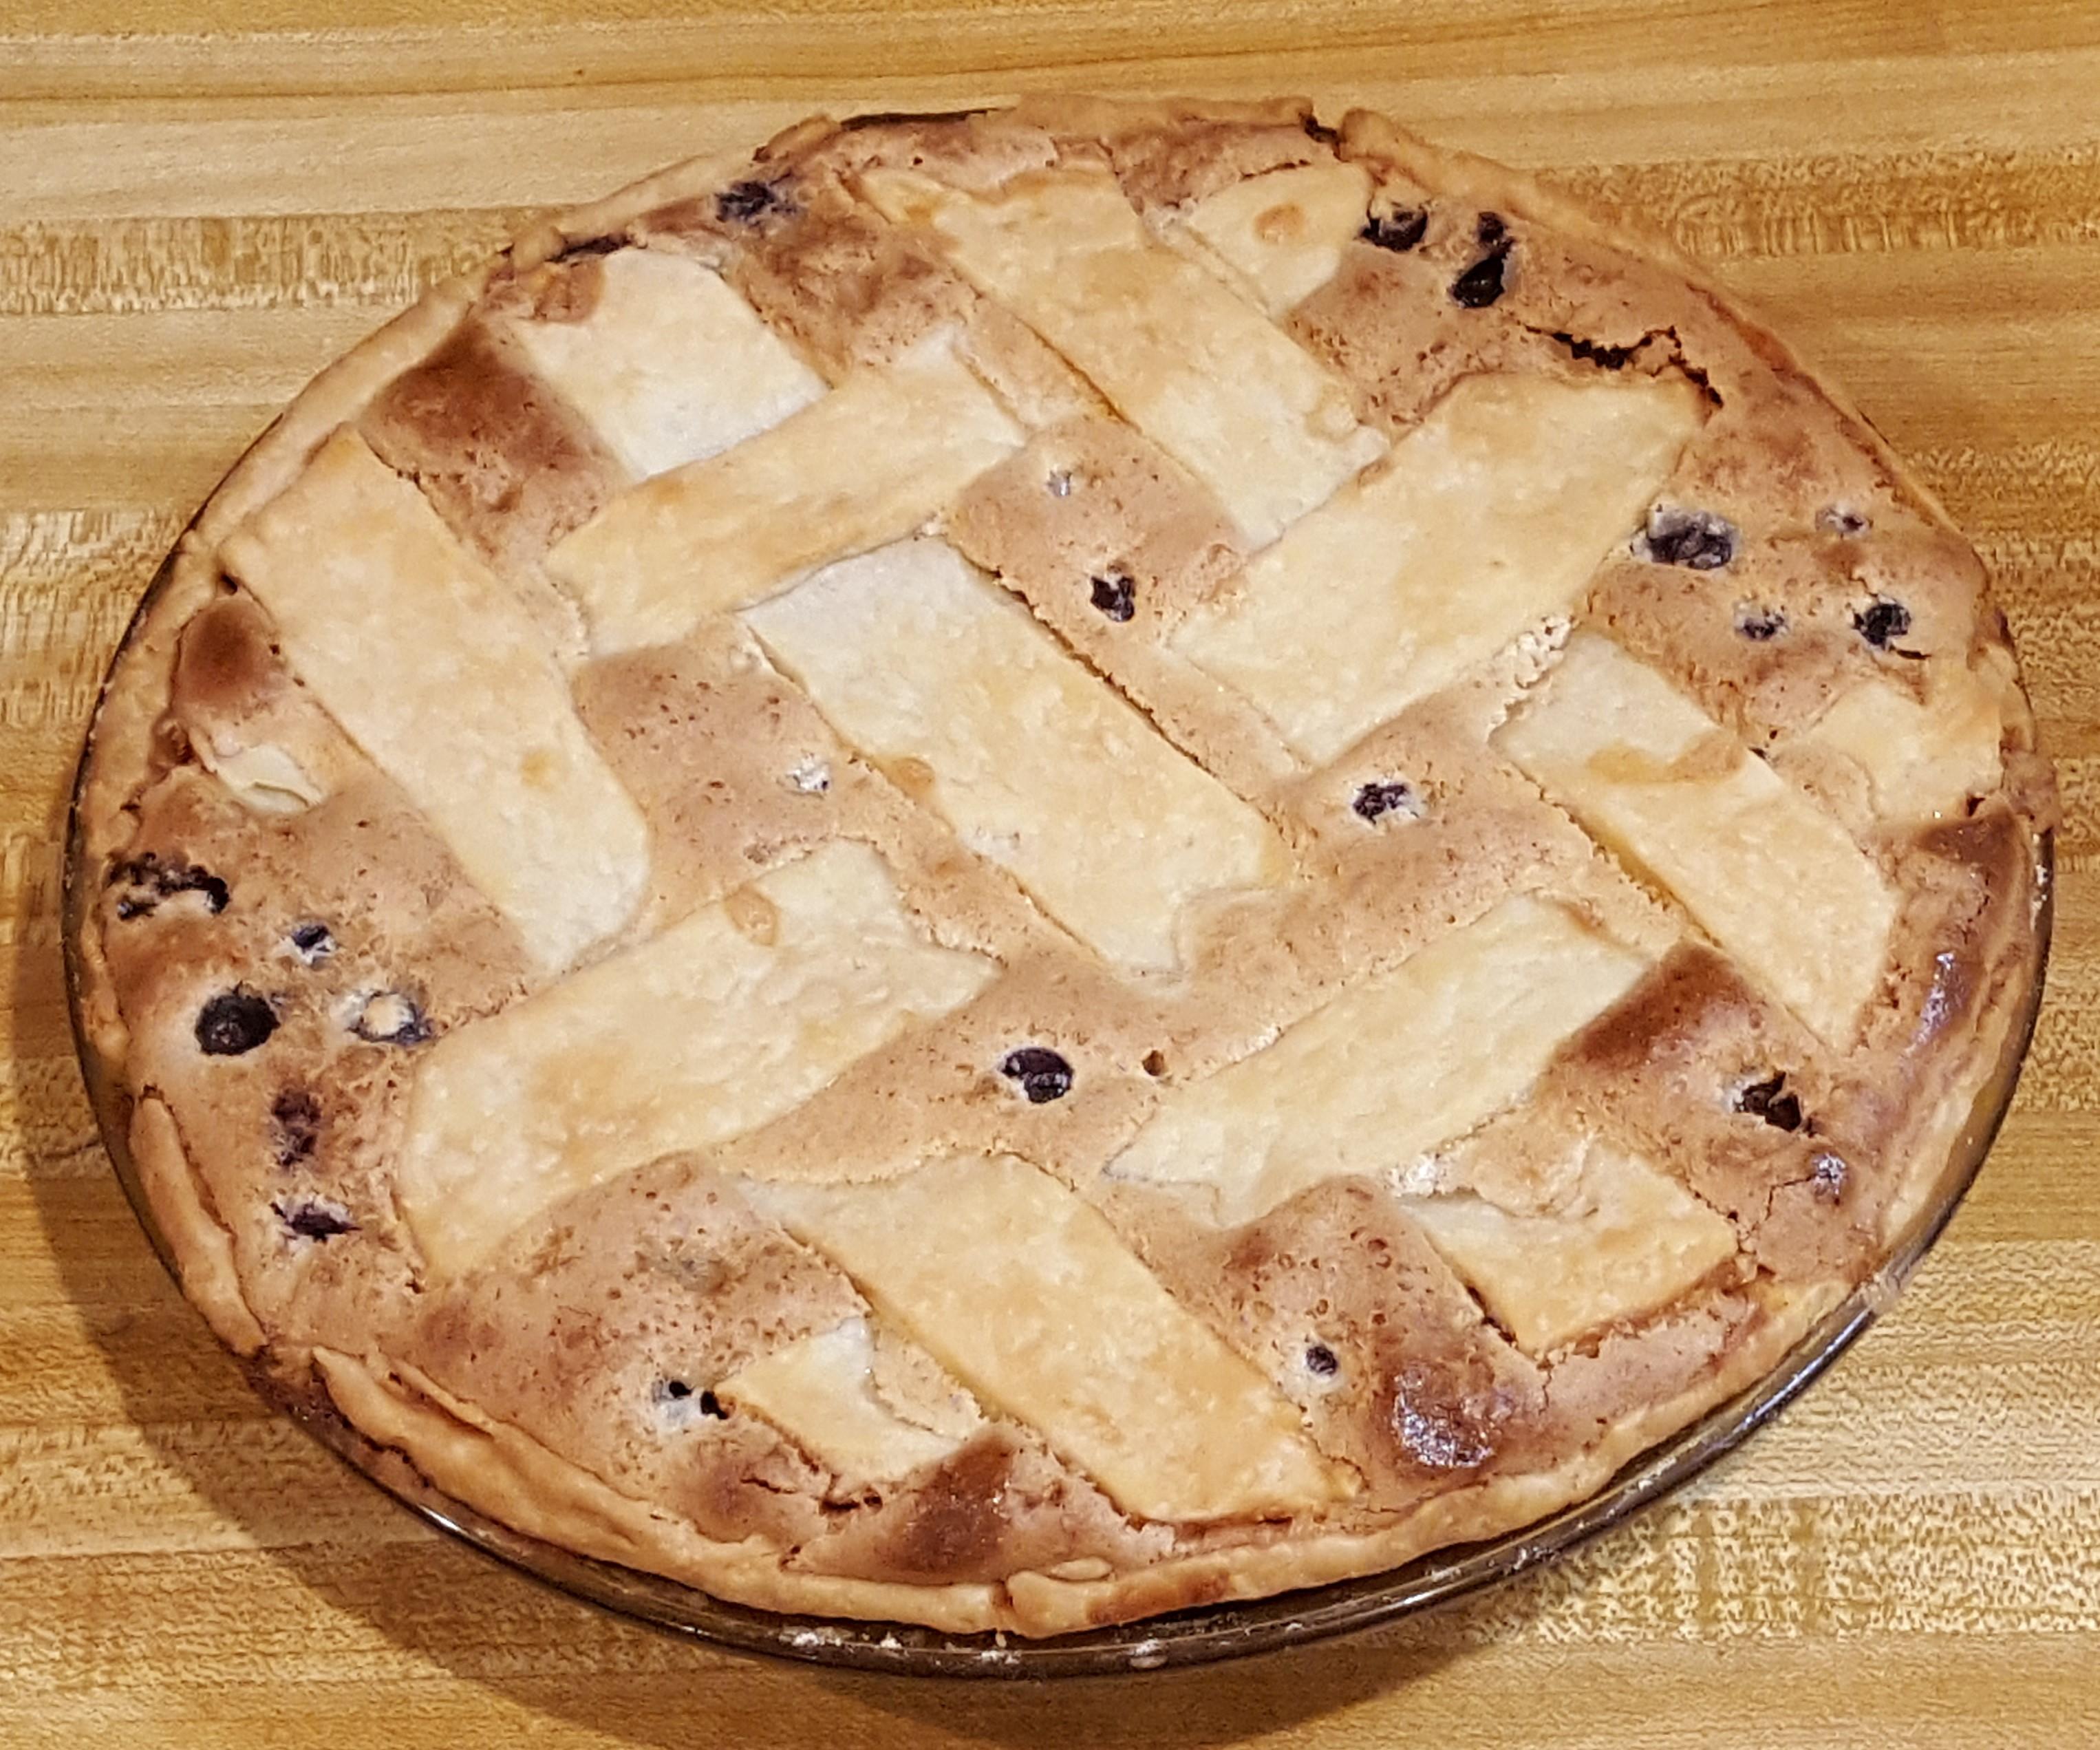 Old-Fashioned Blueberry Custard Pie golfingtx